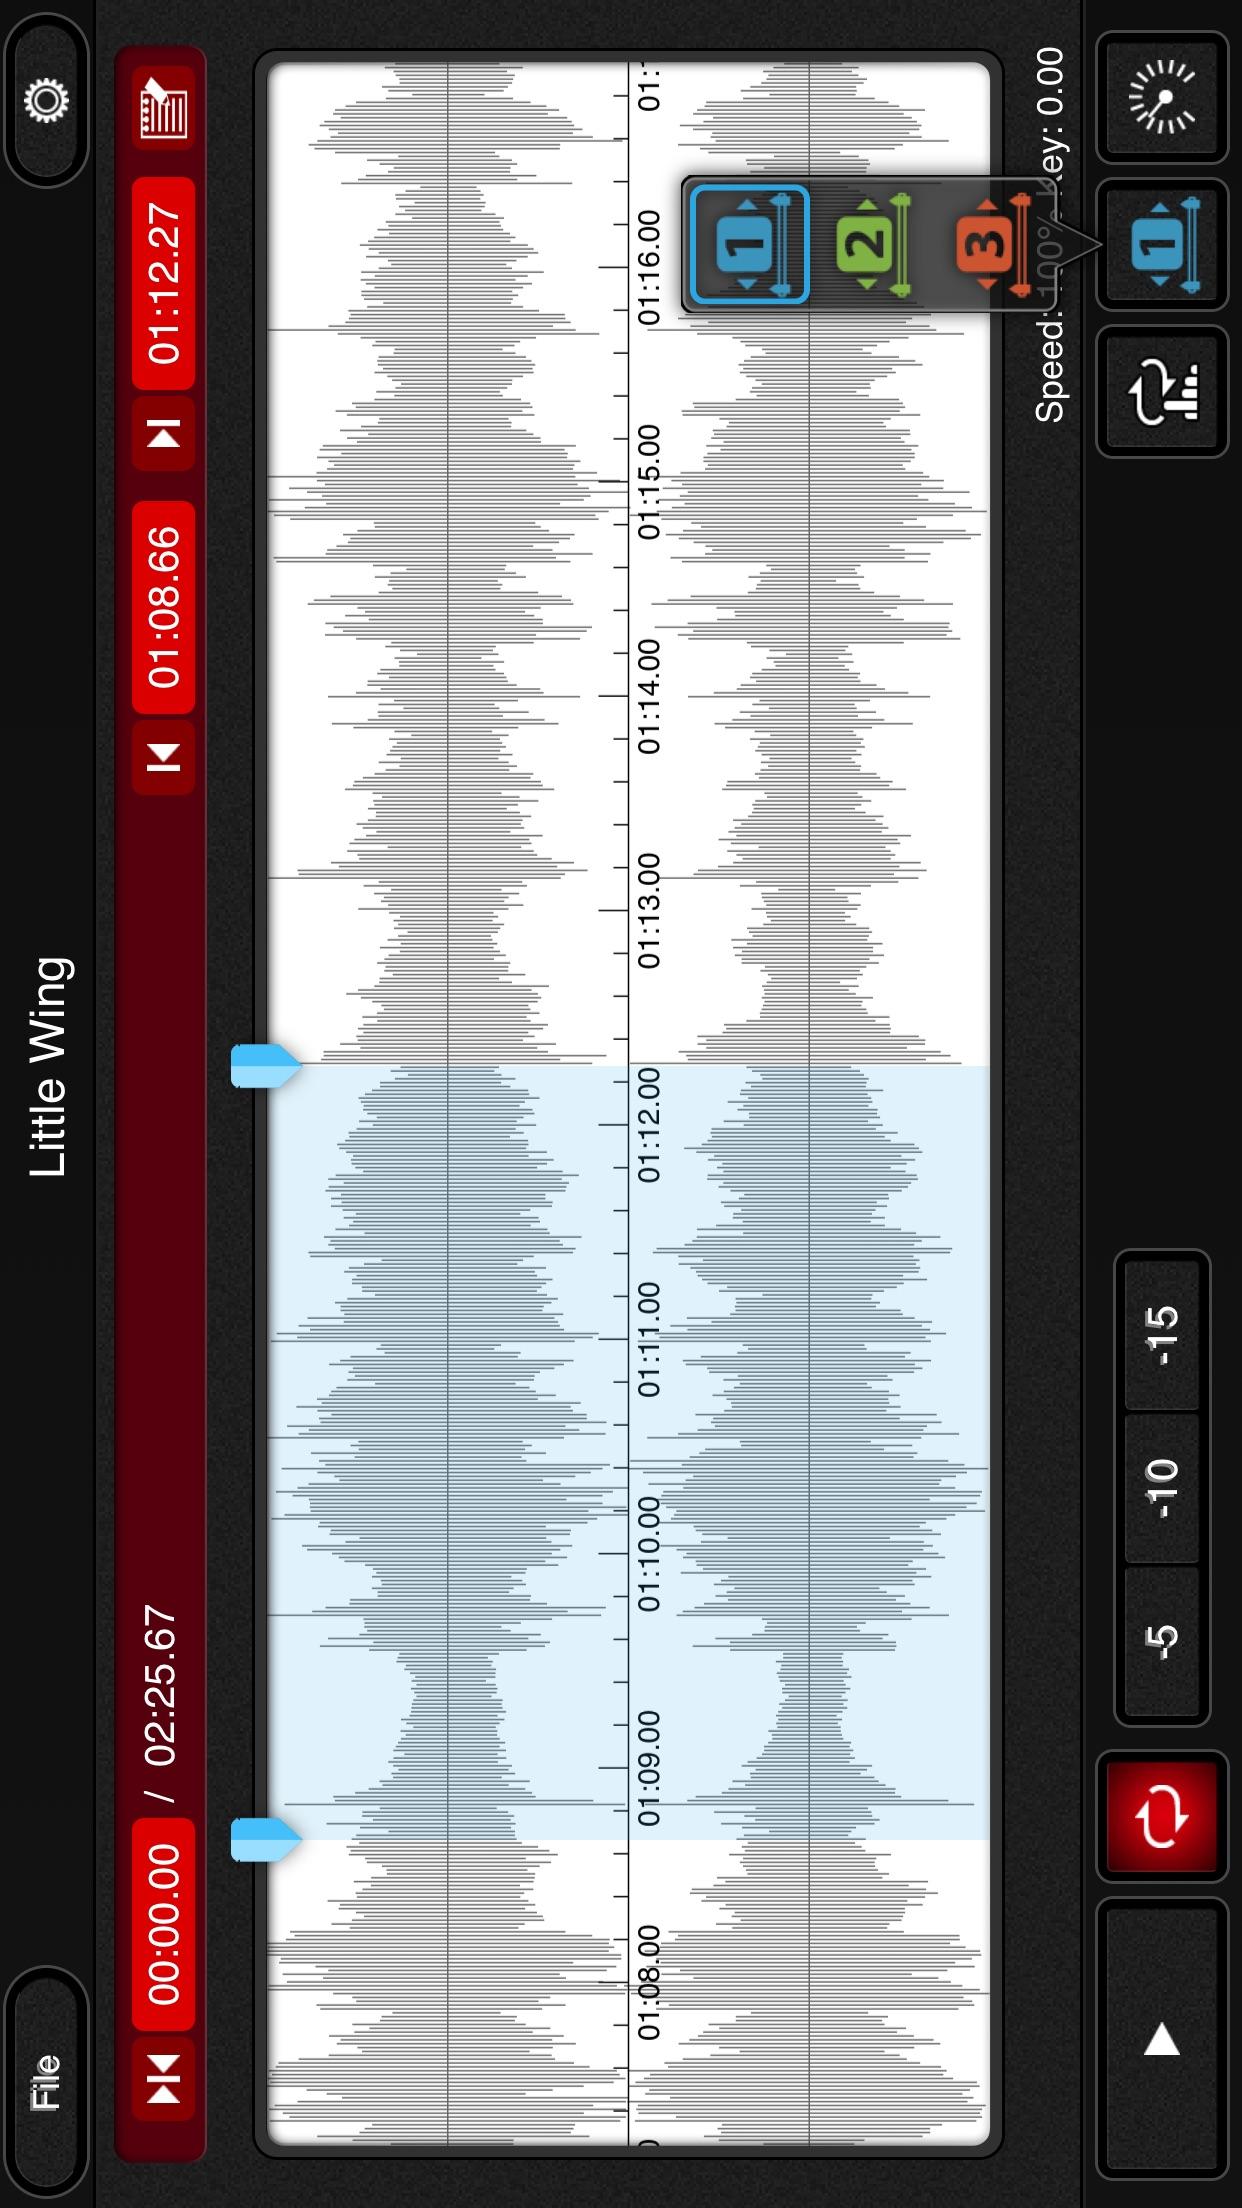 mimiCopy - Slow Down Player Screenshot